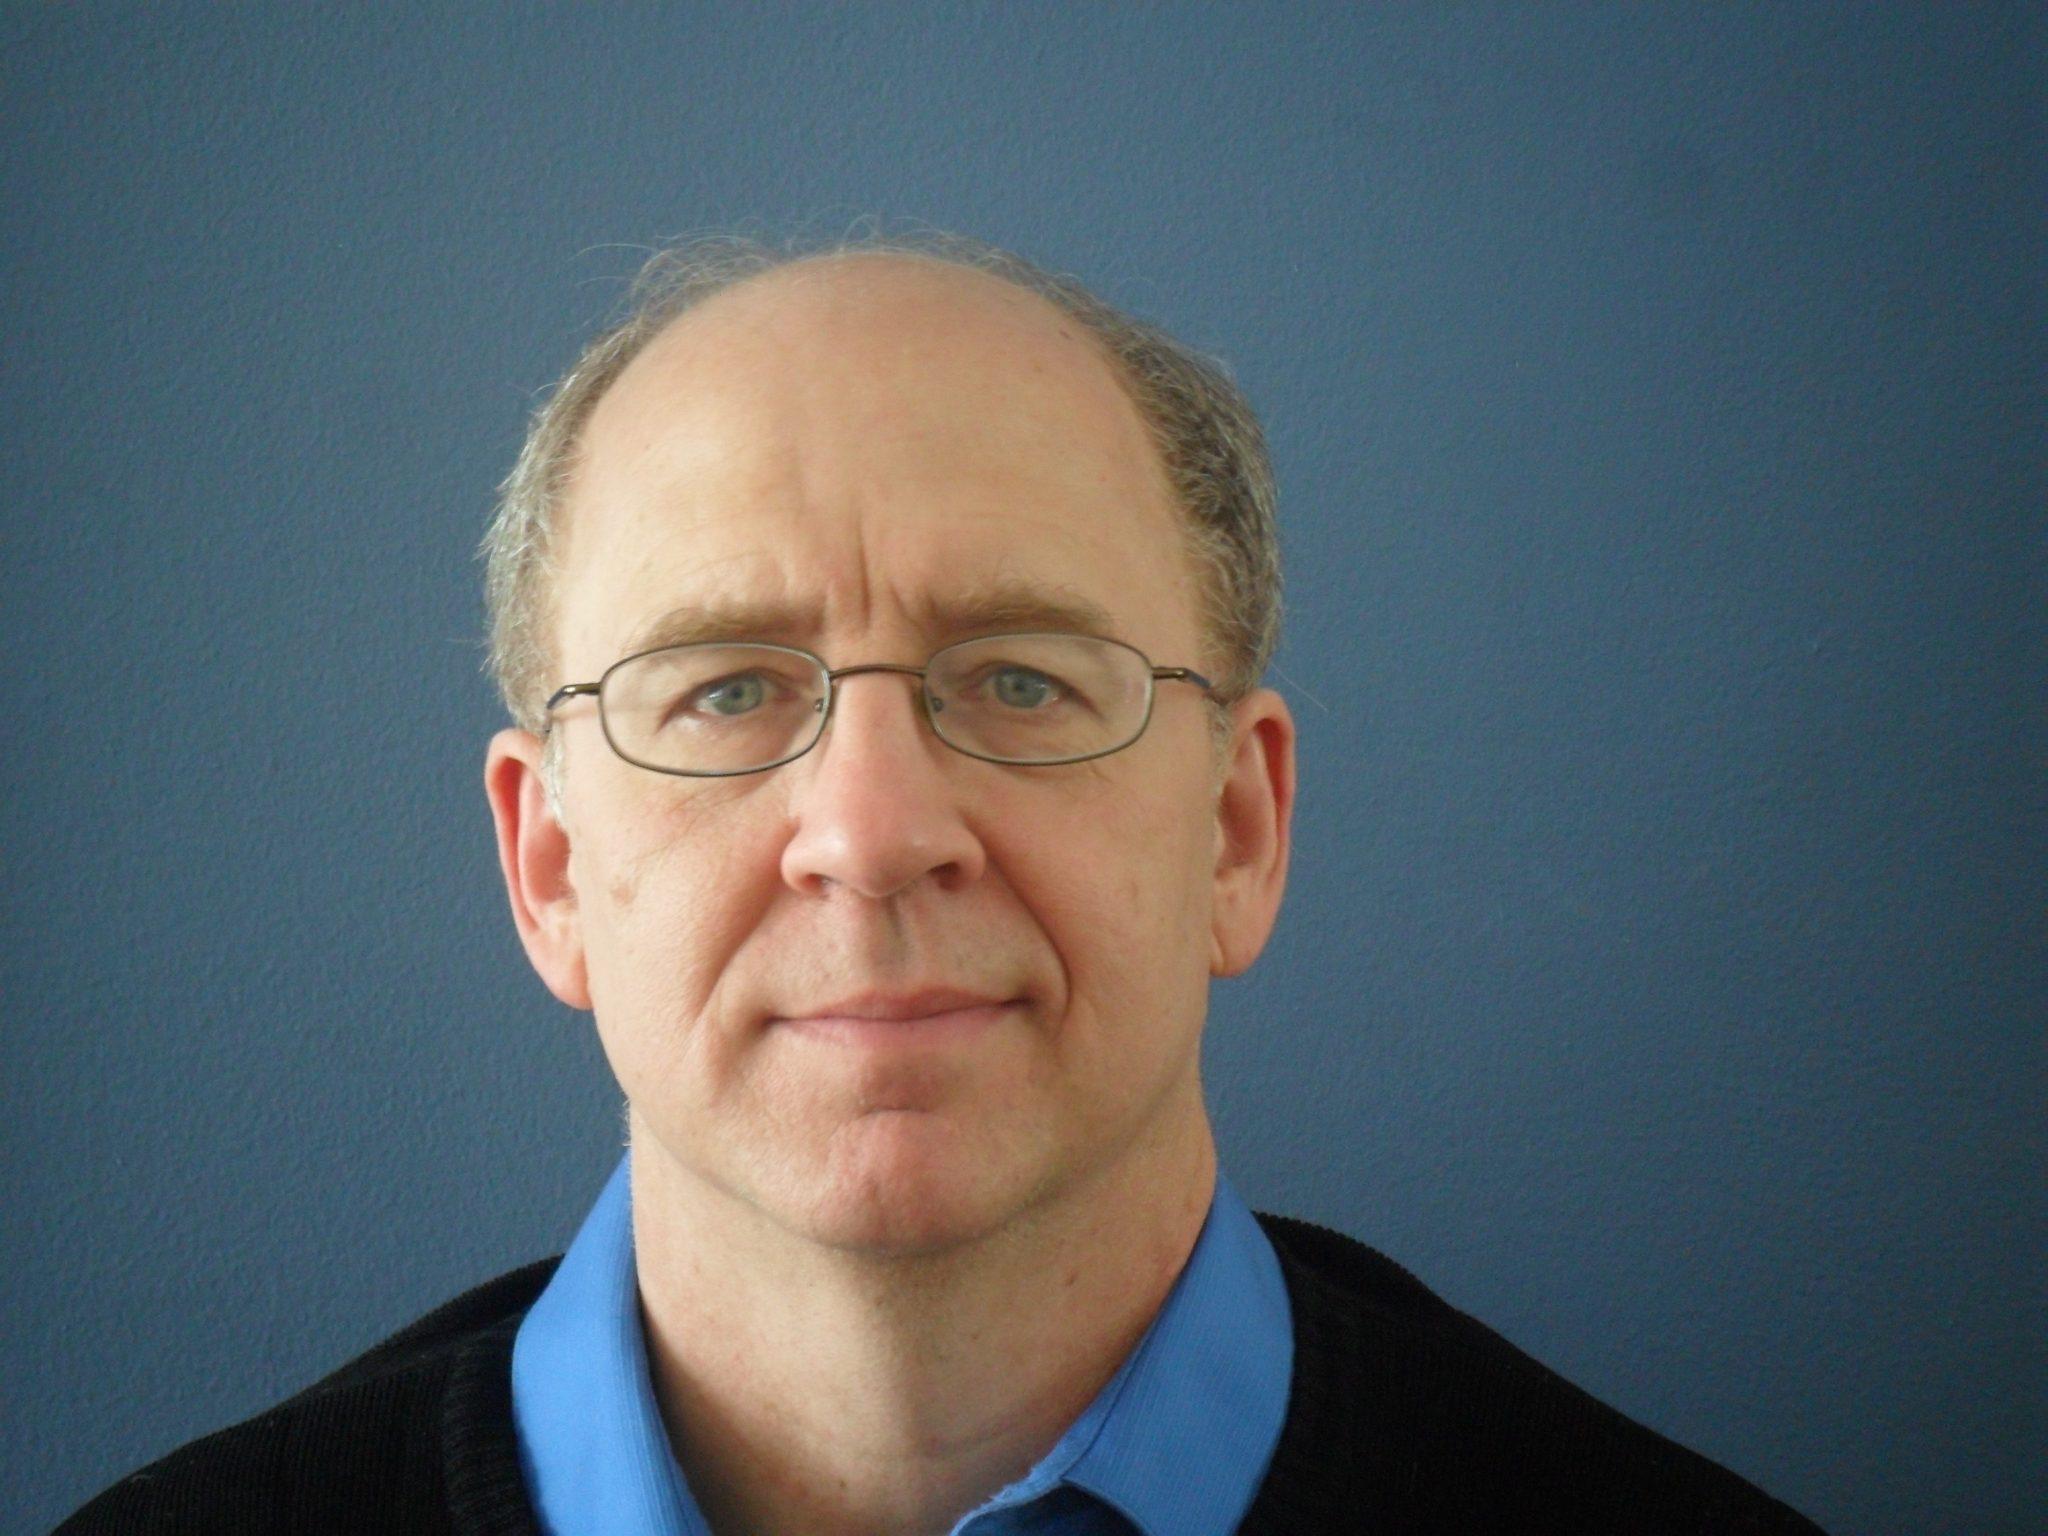 Professor Randy Picker teaches law at the University of Chicago. Photo credit: Randy Picker.